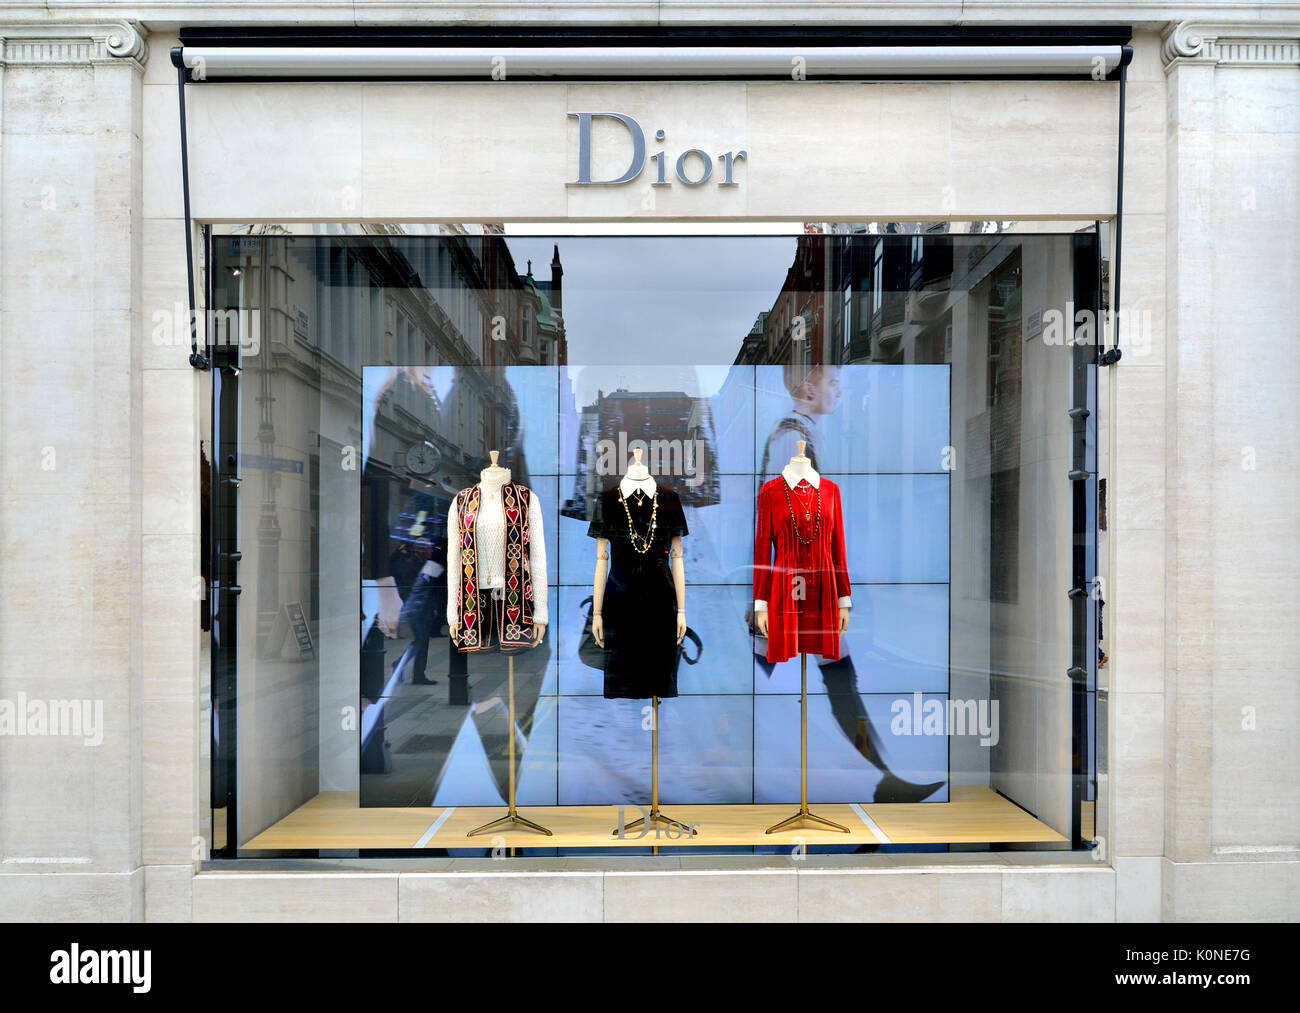 384521c16c7e Dior Shop Window Display Stock Photos   Dior Shop Window Display ...